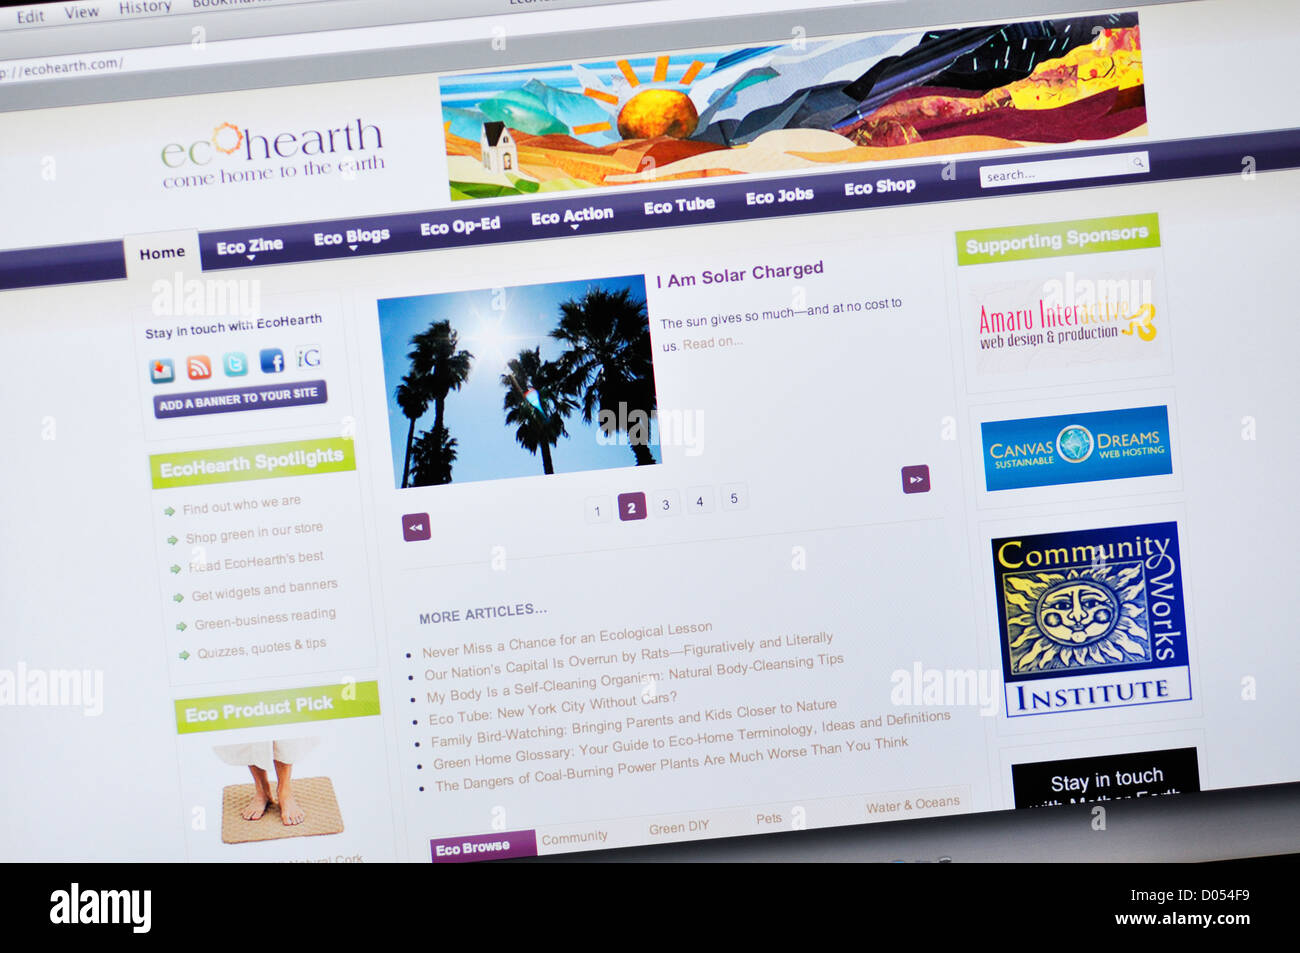 ecohearth website environmental websites for top green ecohearth website environmental websites for top green ecology news green jobs